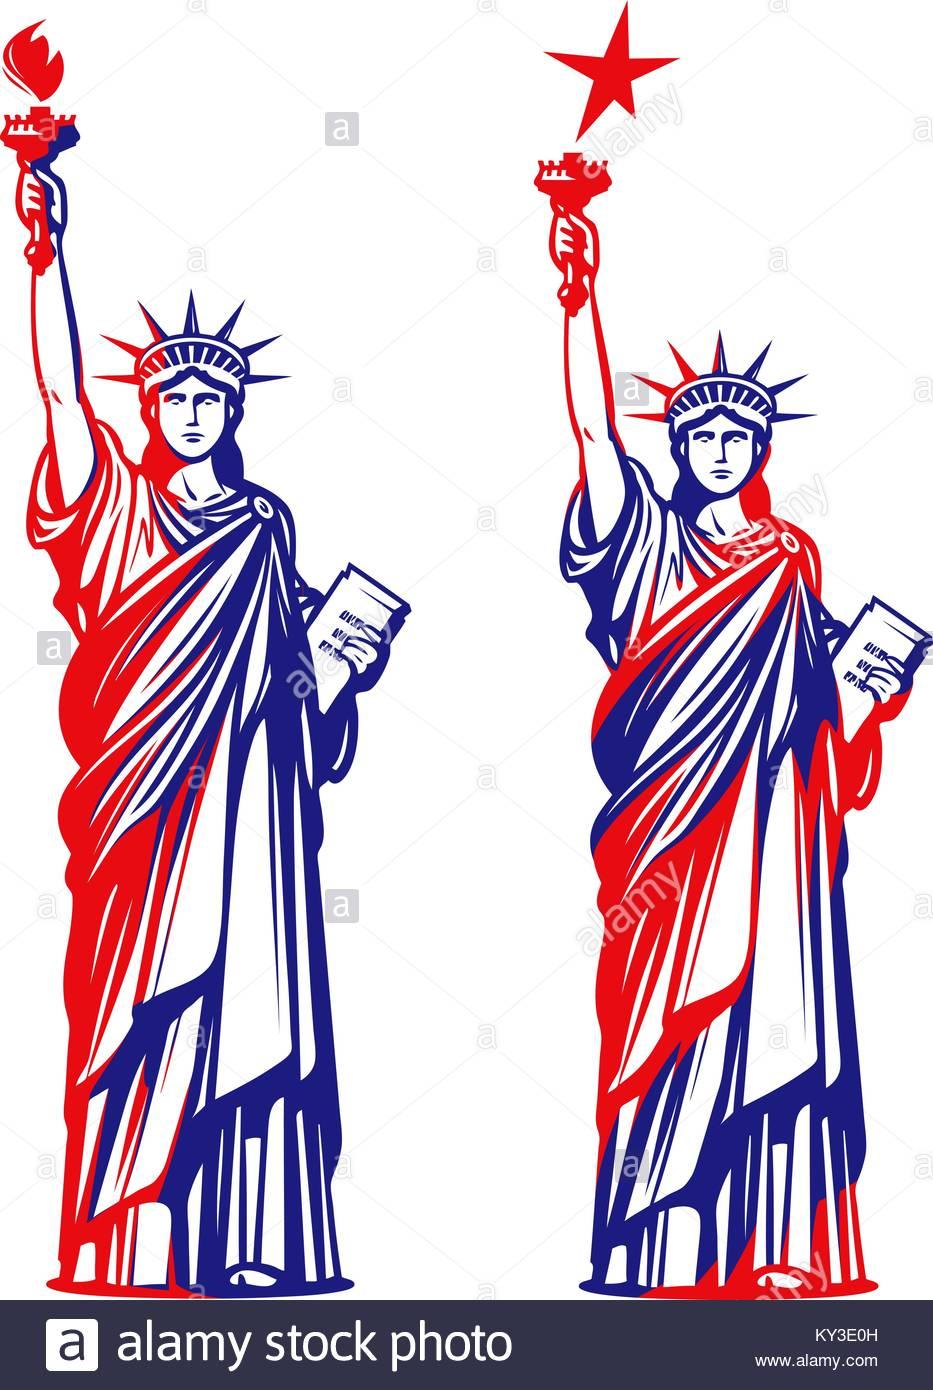 933x1390 Illustration Lady Statue Liberty Torch Stock Photos Amp Illustration